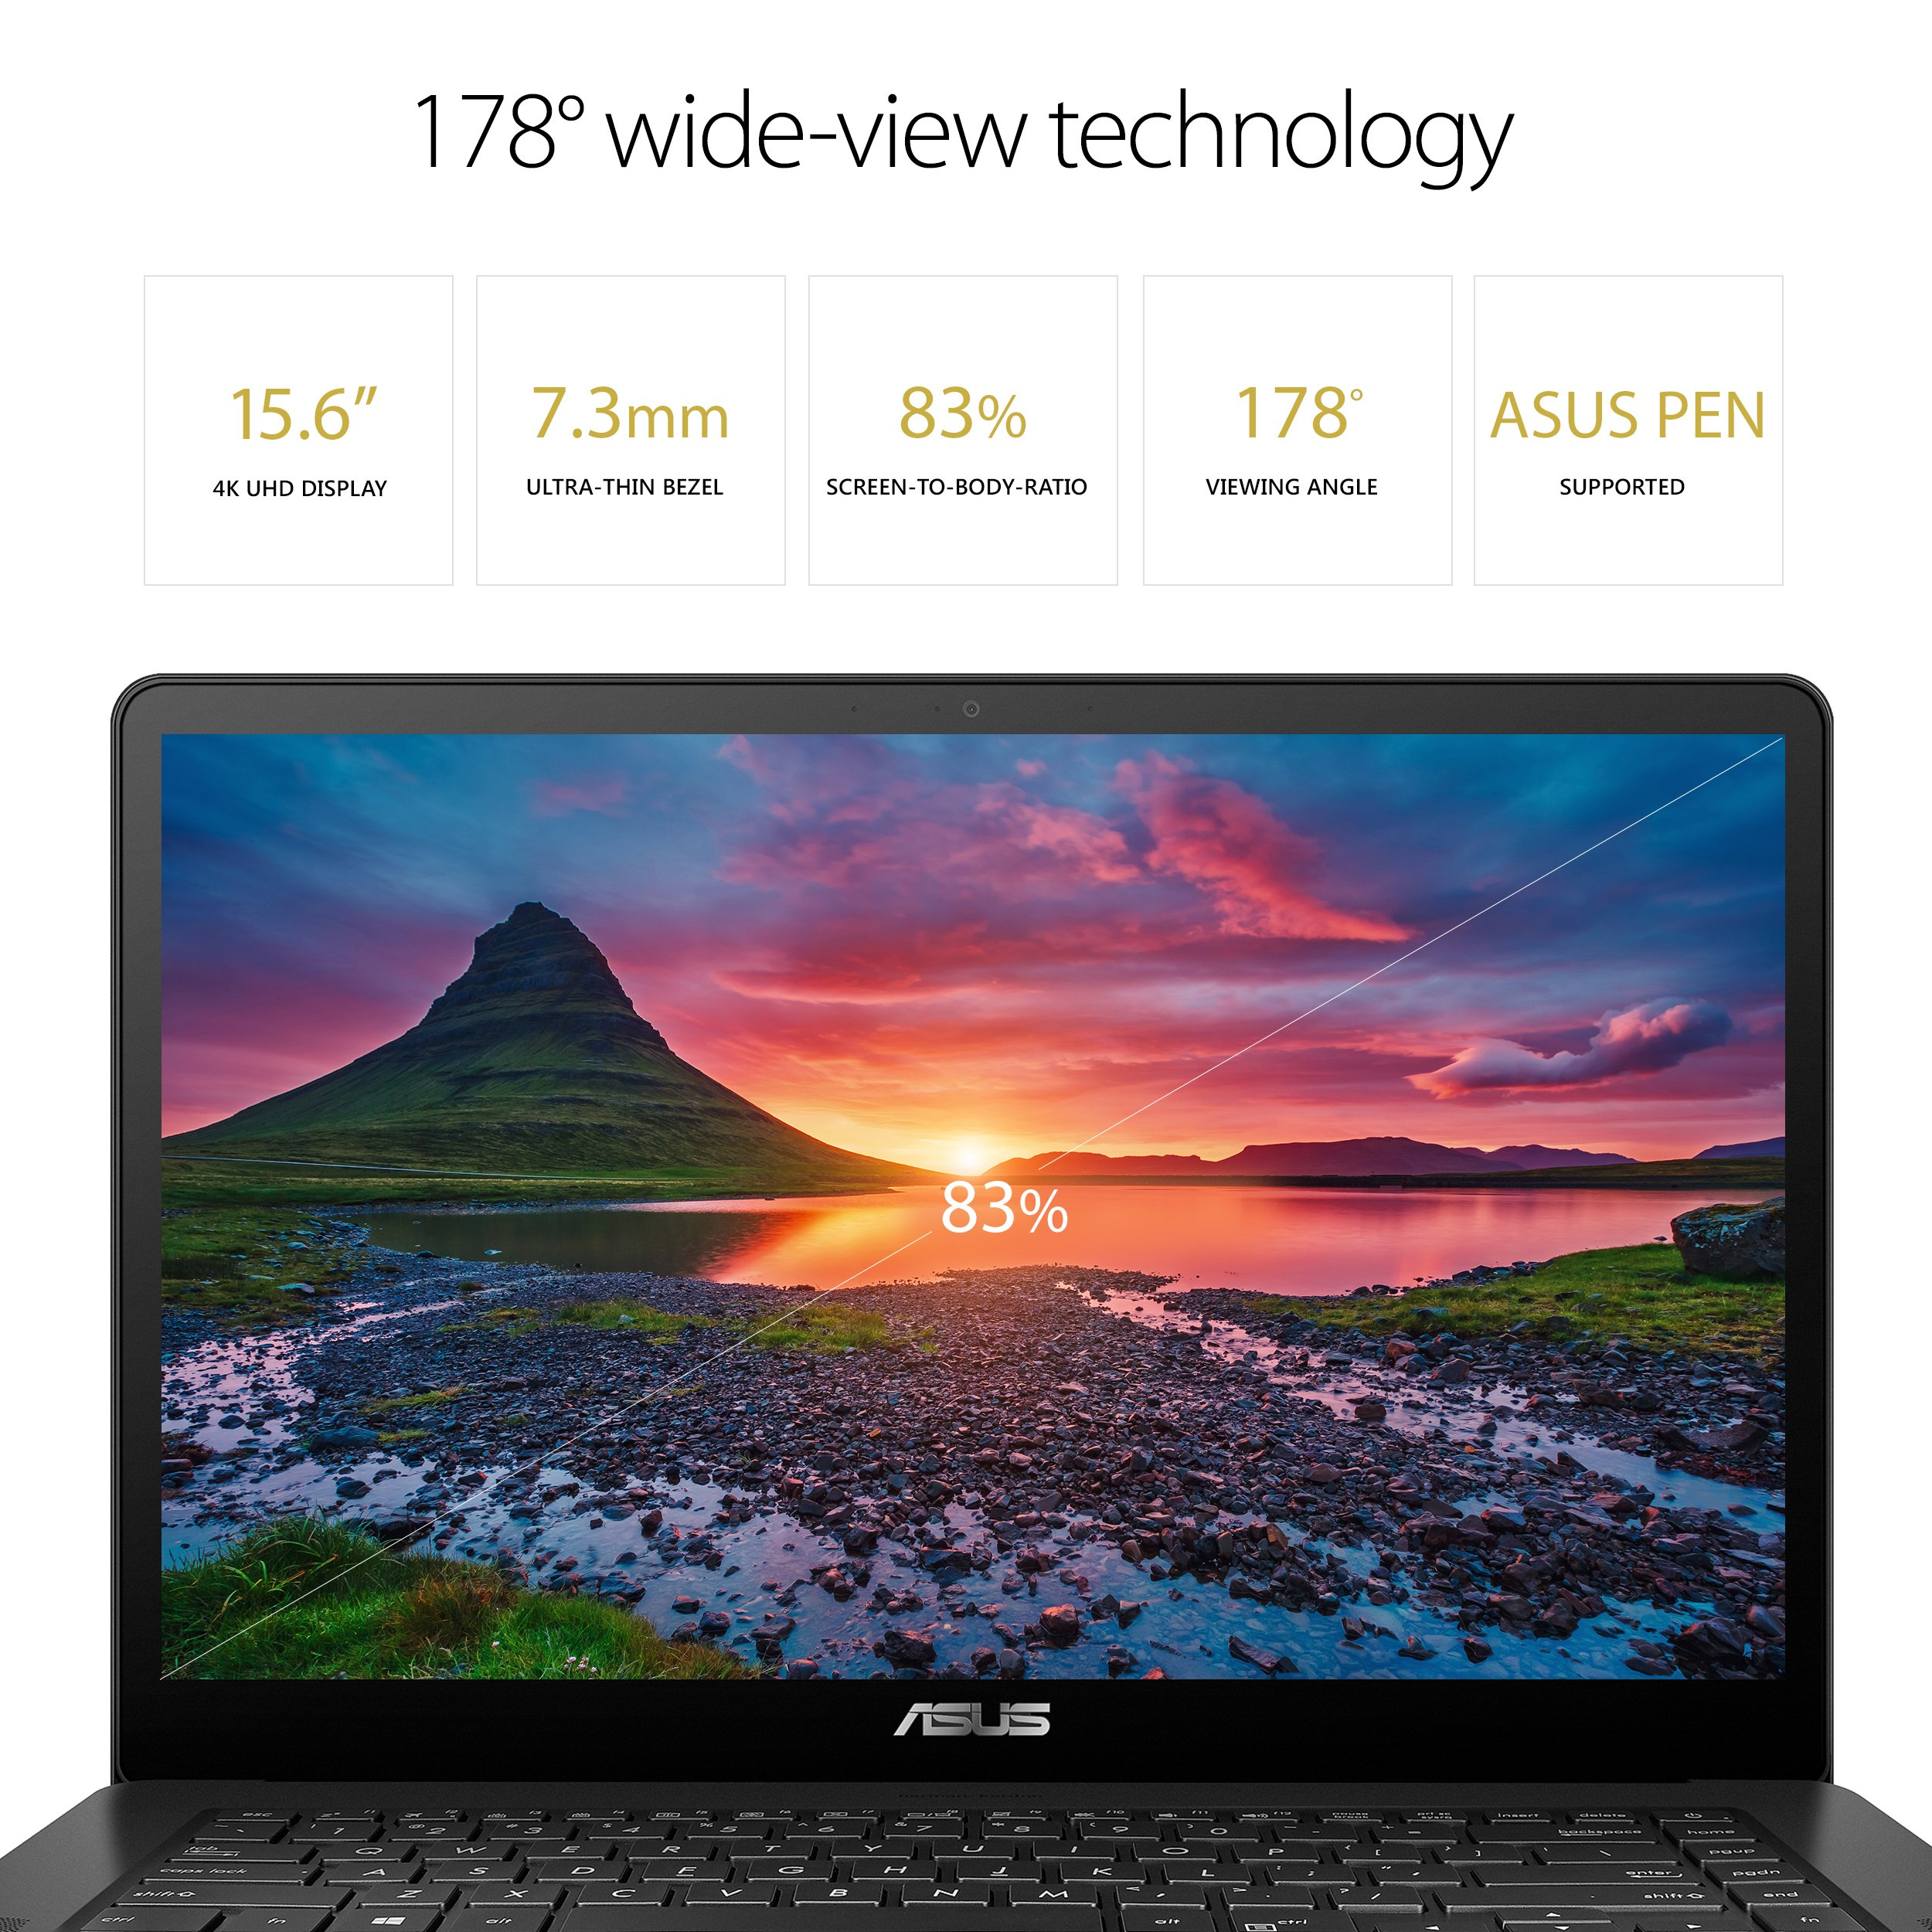 "ASUS ZenBook Pro 15 Thin & Light Ultrabook Laptop, 15.6"" Full HD NanoEdge Touch, Intel Core i7-7700HQ, GTX 1050 Ti, 16GB DDR4 RAM, 512GB SSD, Backlit KB, Fingerprint, Windows 10 - UX550VE-DB71T, Black"